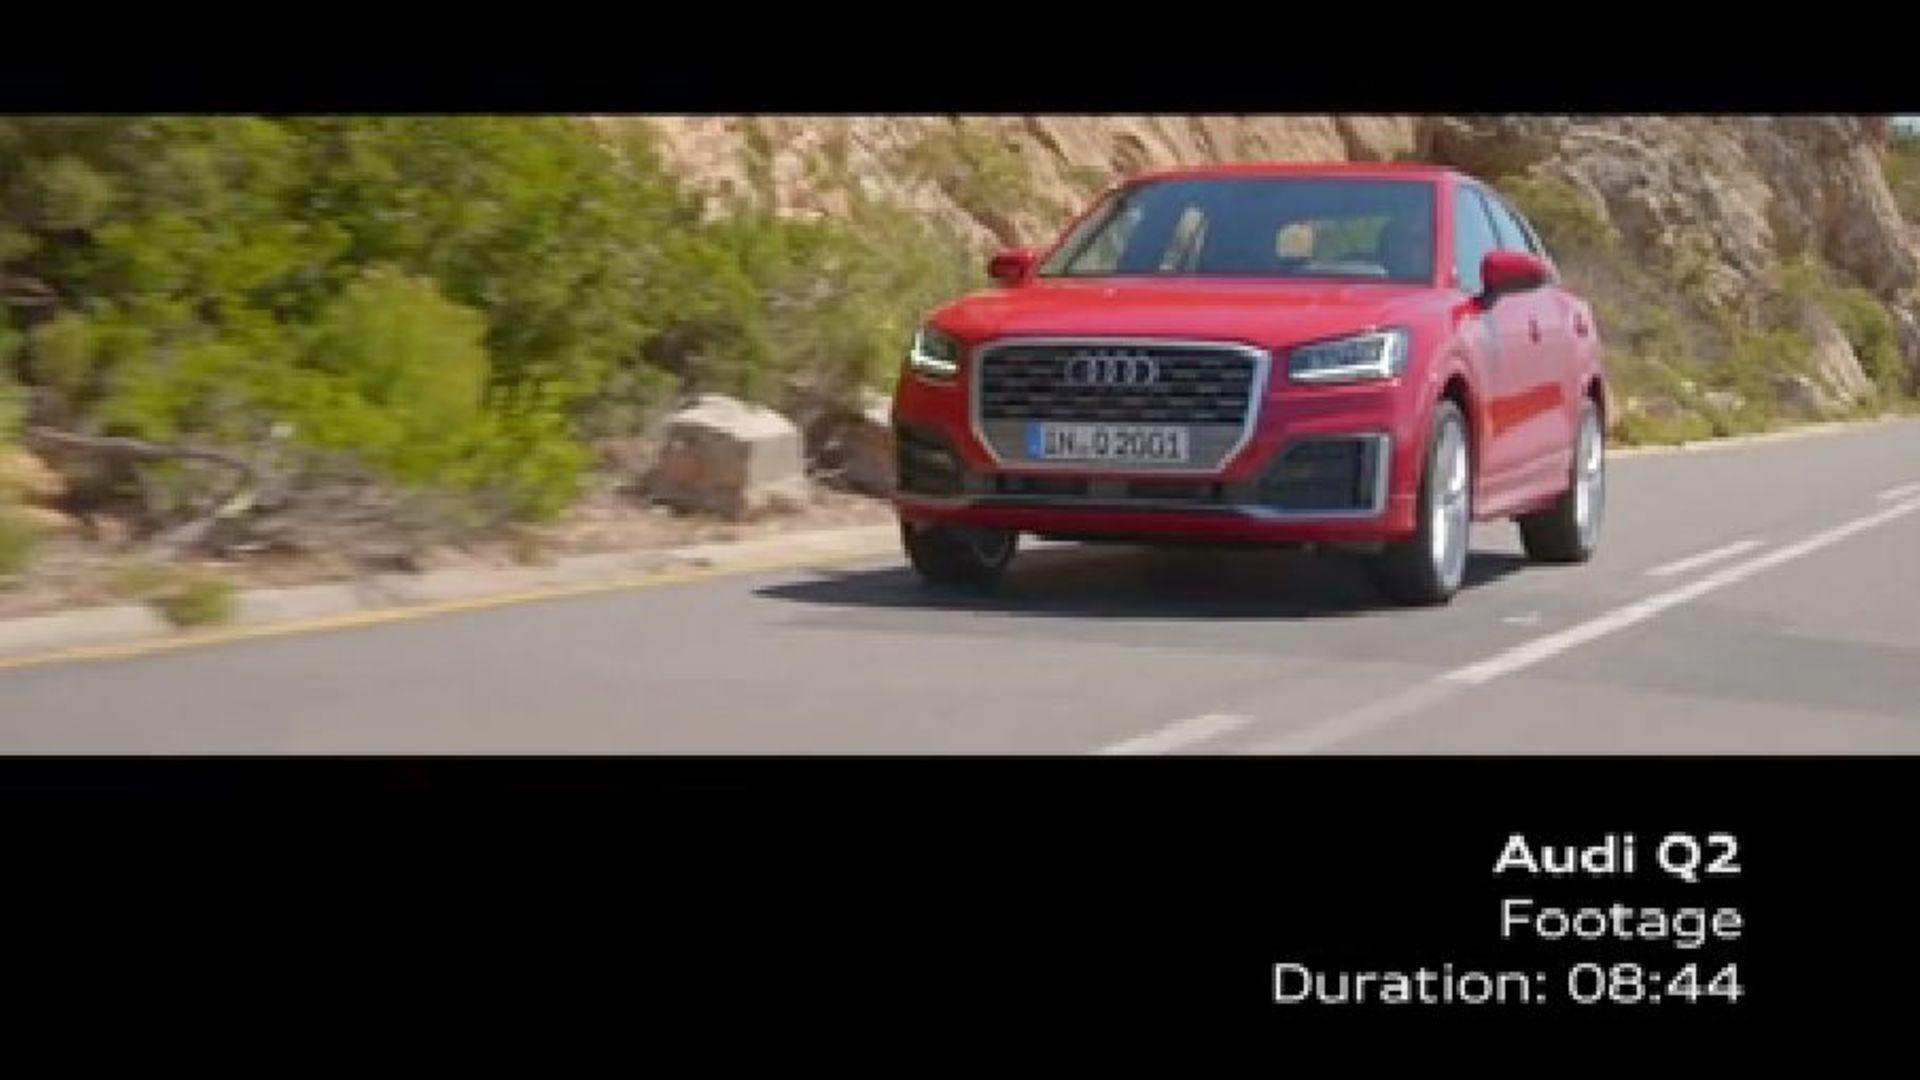 Audi Q2 - Footage Tangorot